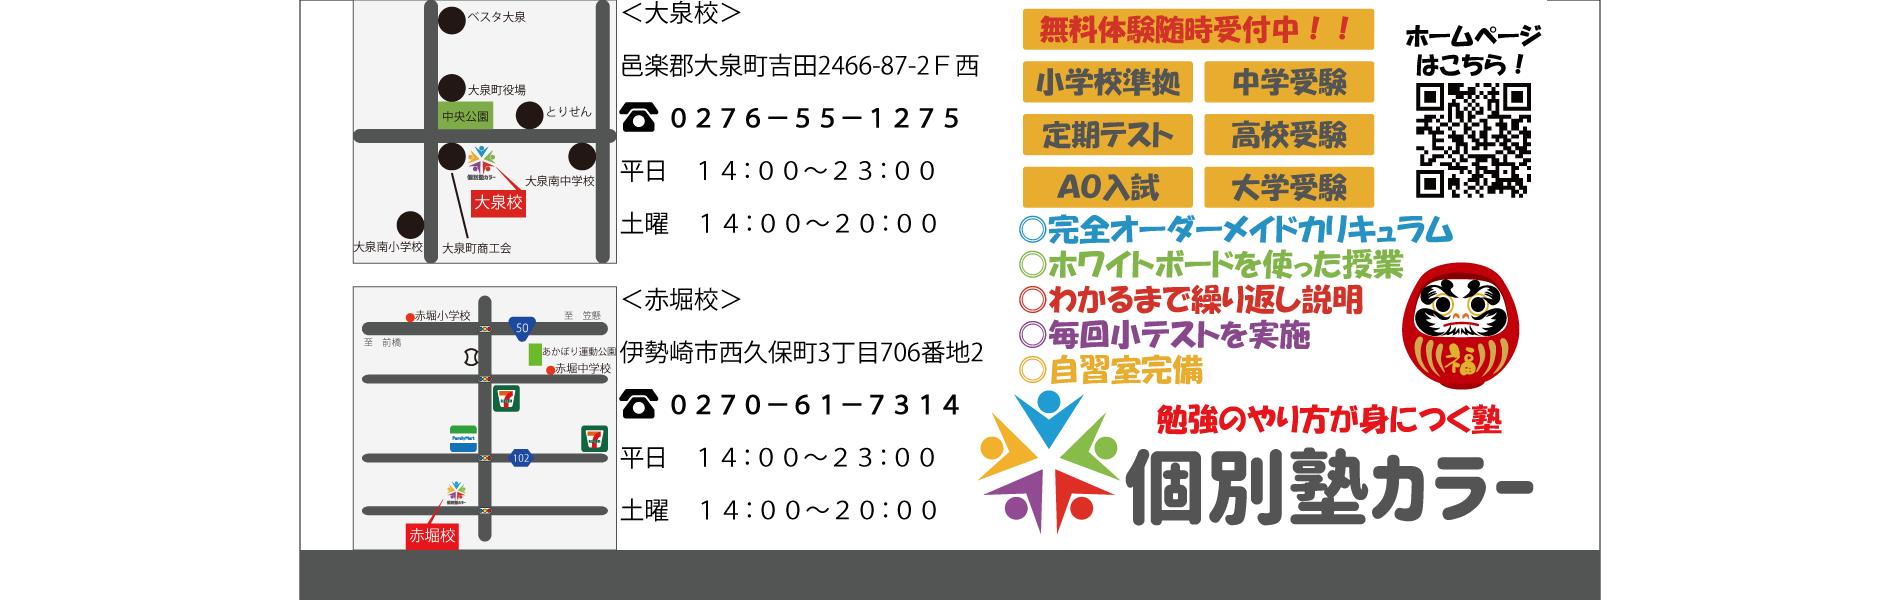 個別塾カラー/基本情報